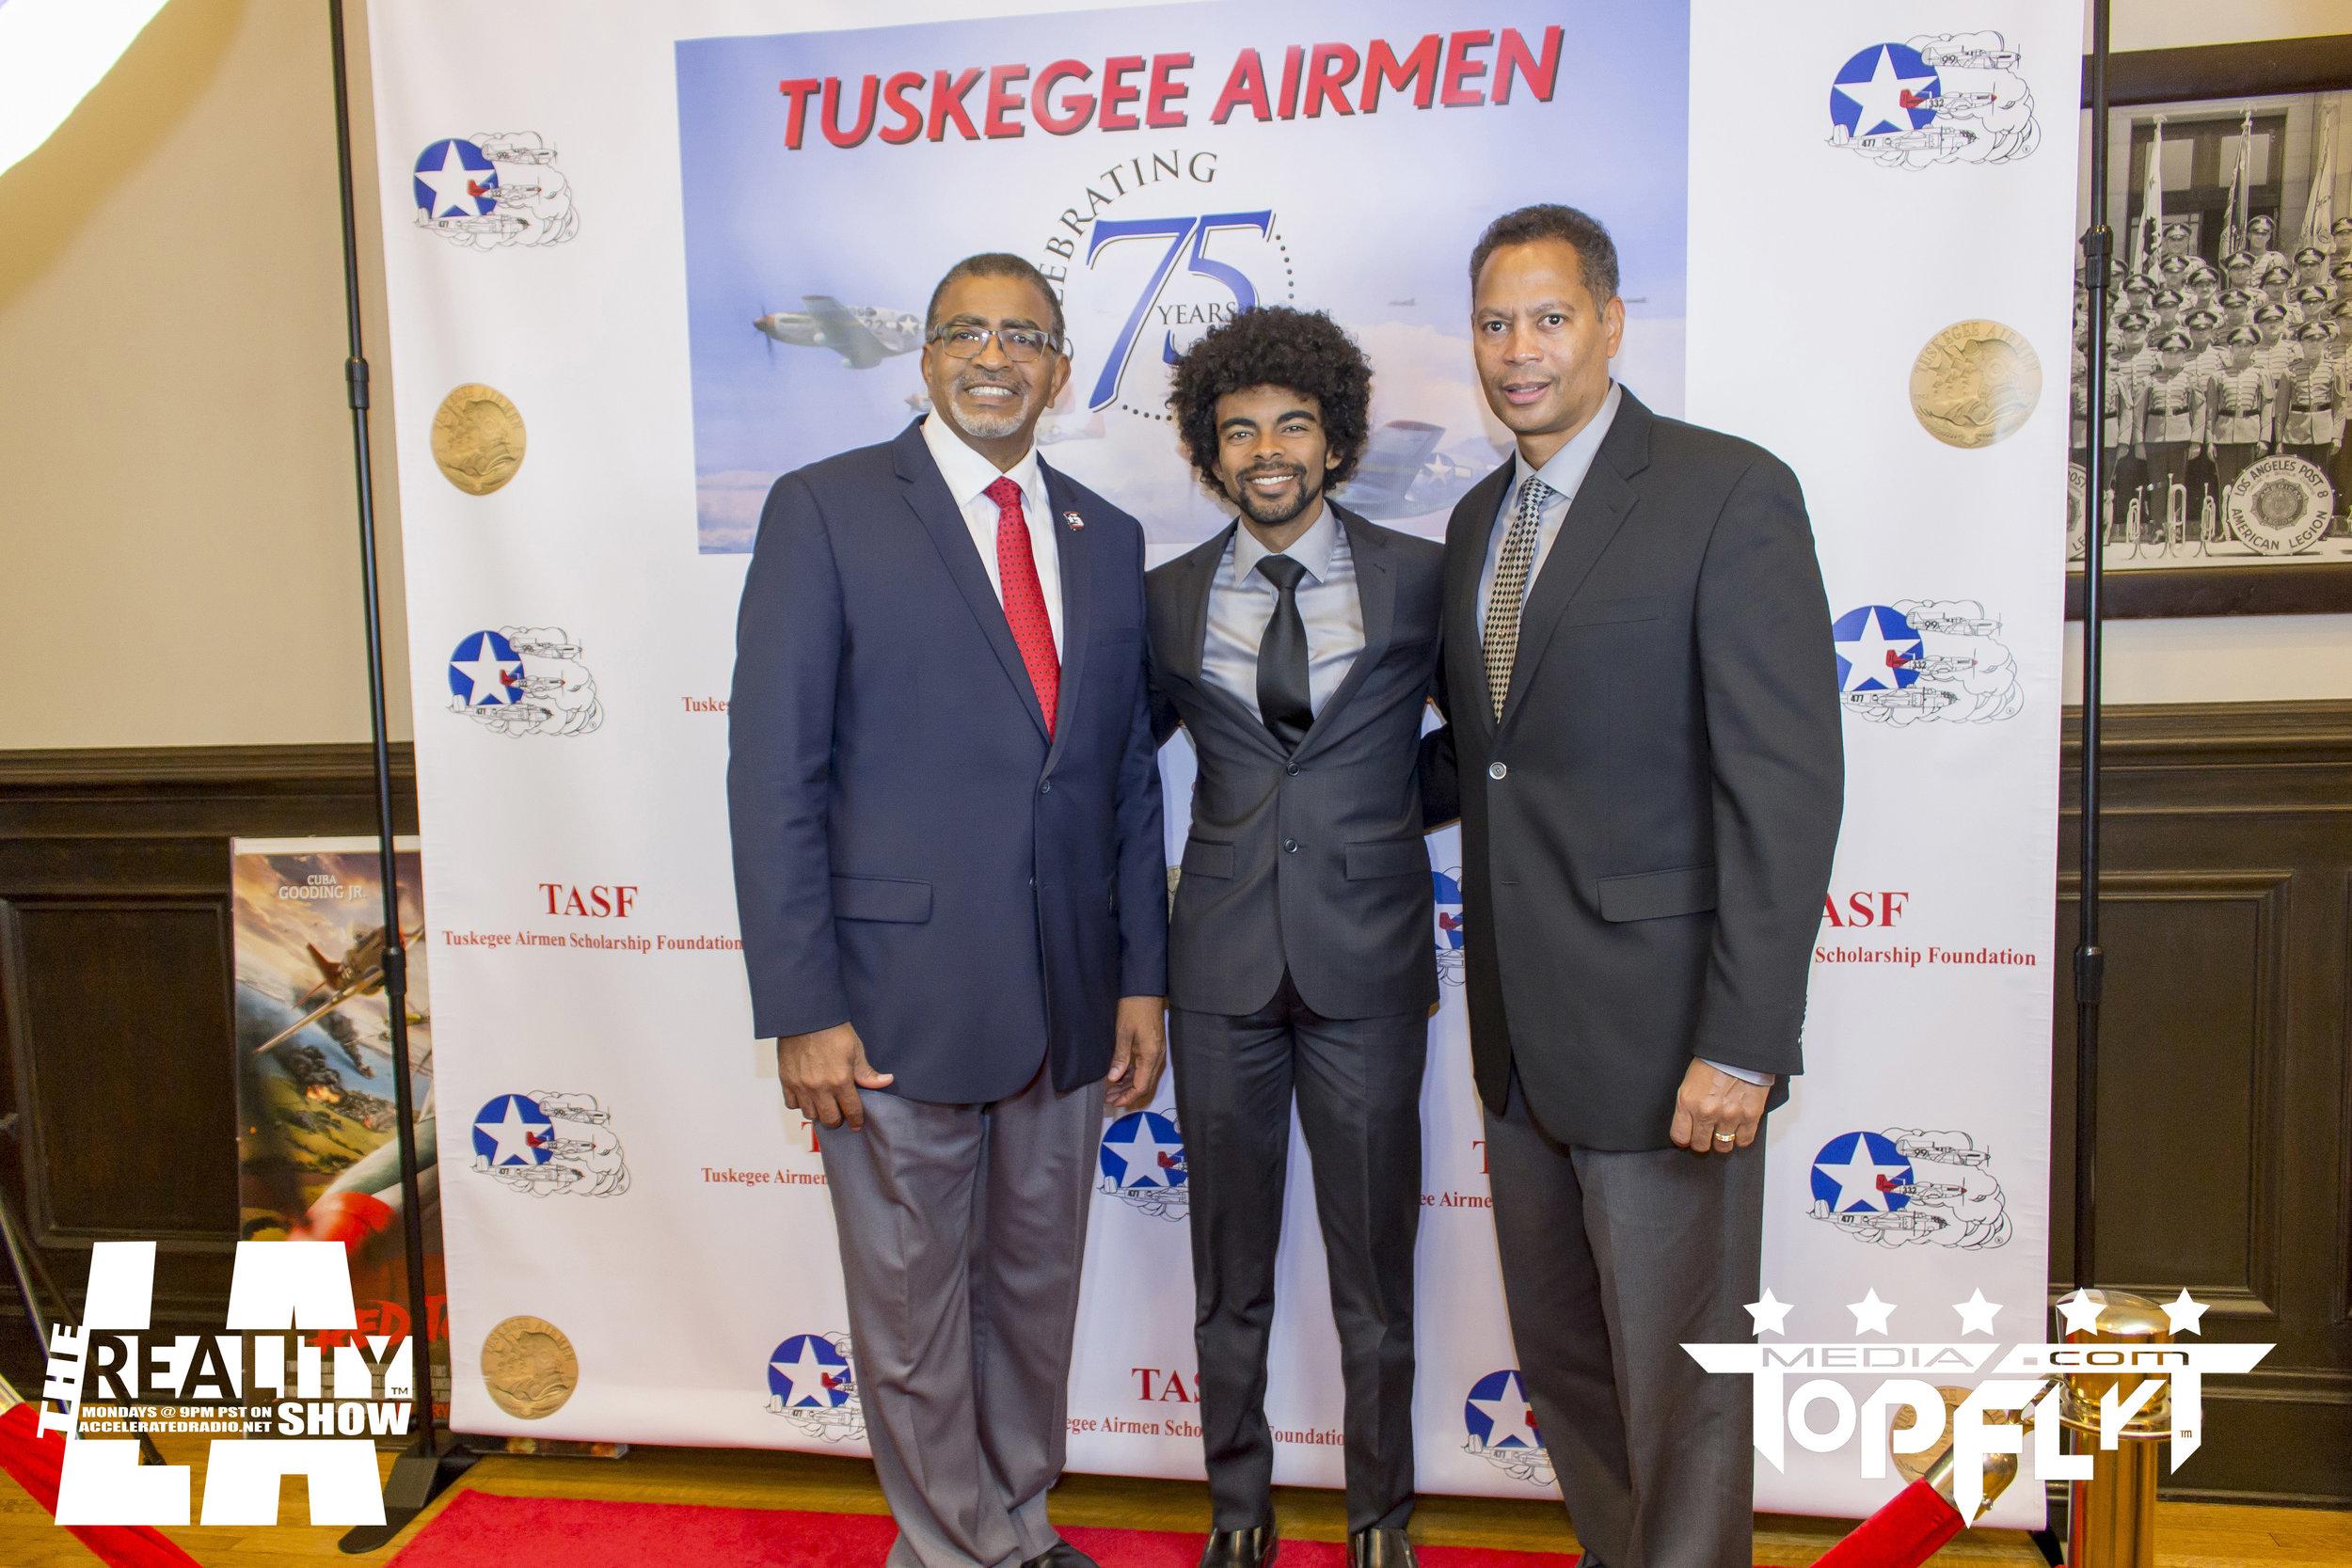 The Reality Show LA - Tuskegee Airmen 75th Anniversary VIP Reception_105.jpg